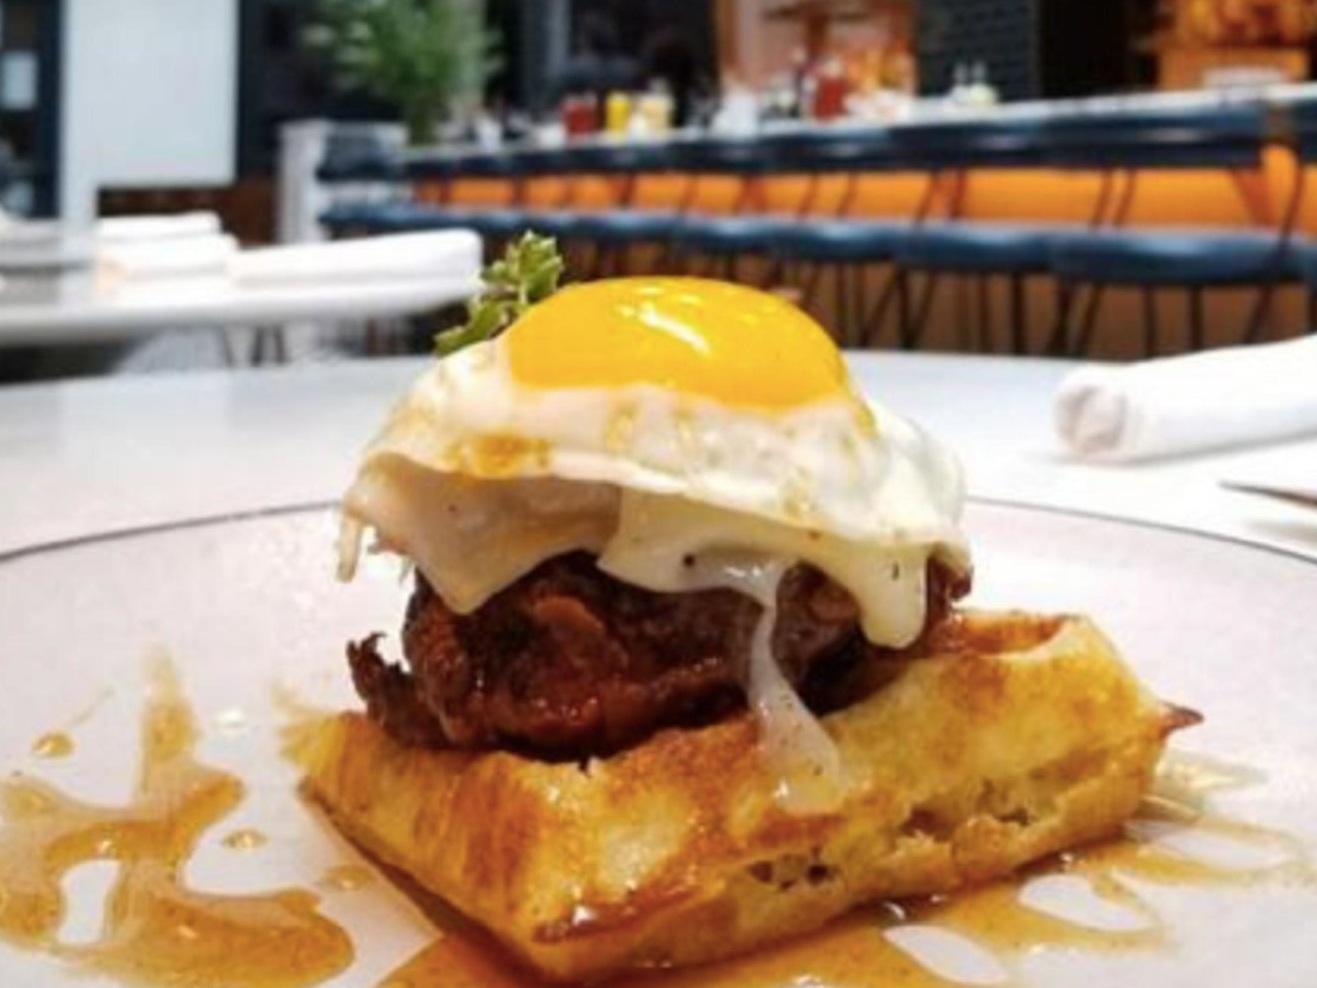 Food Network - 2019 Stateside Kitchen